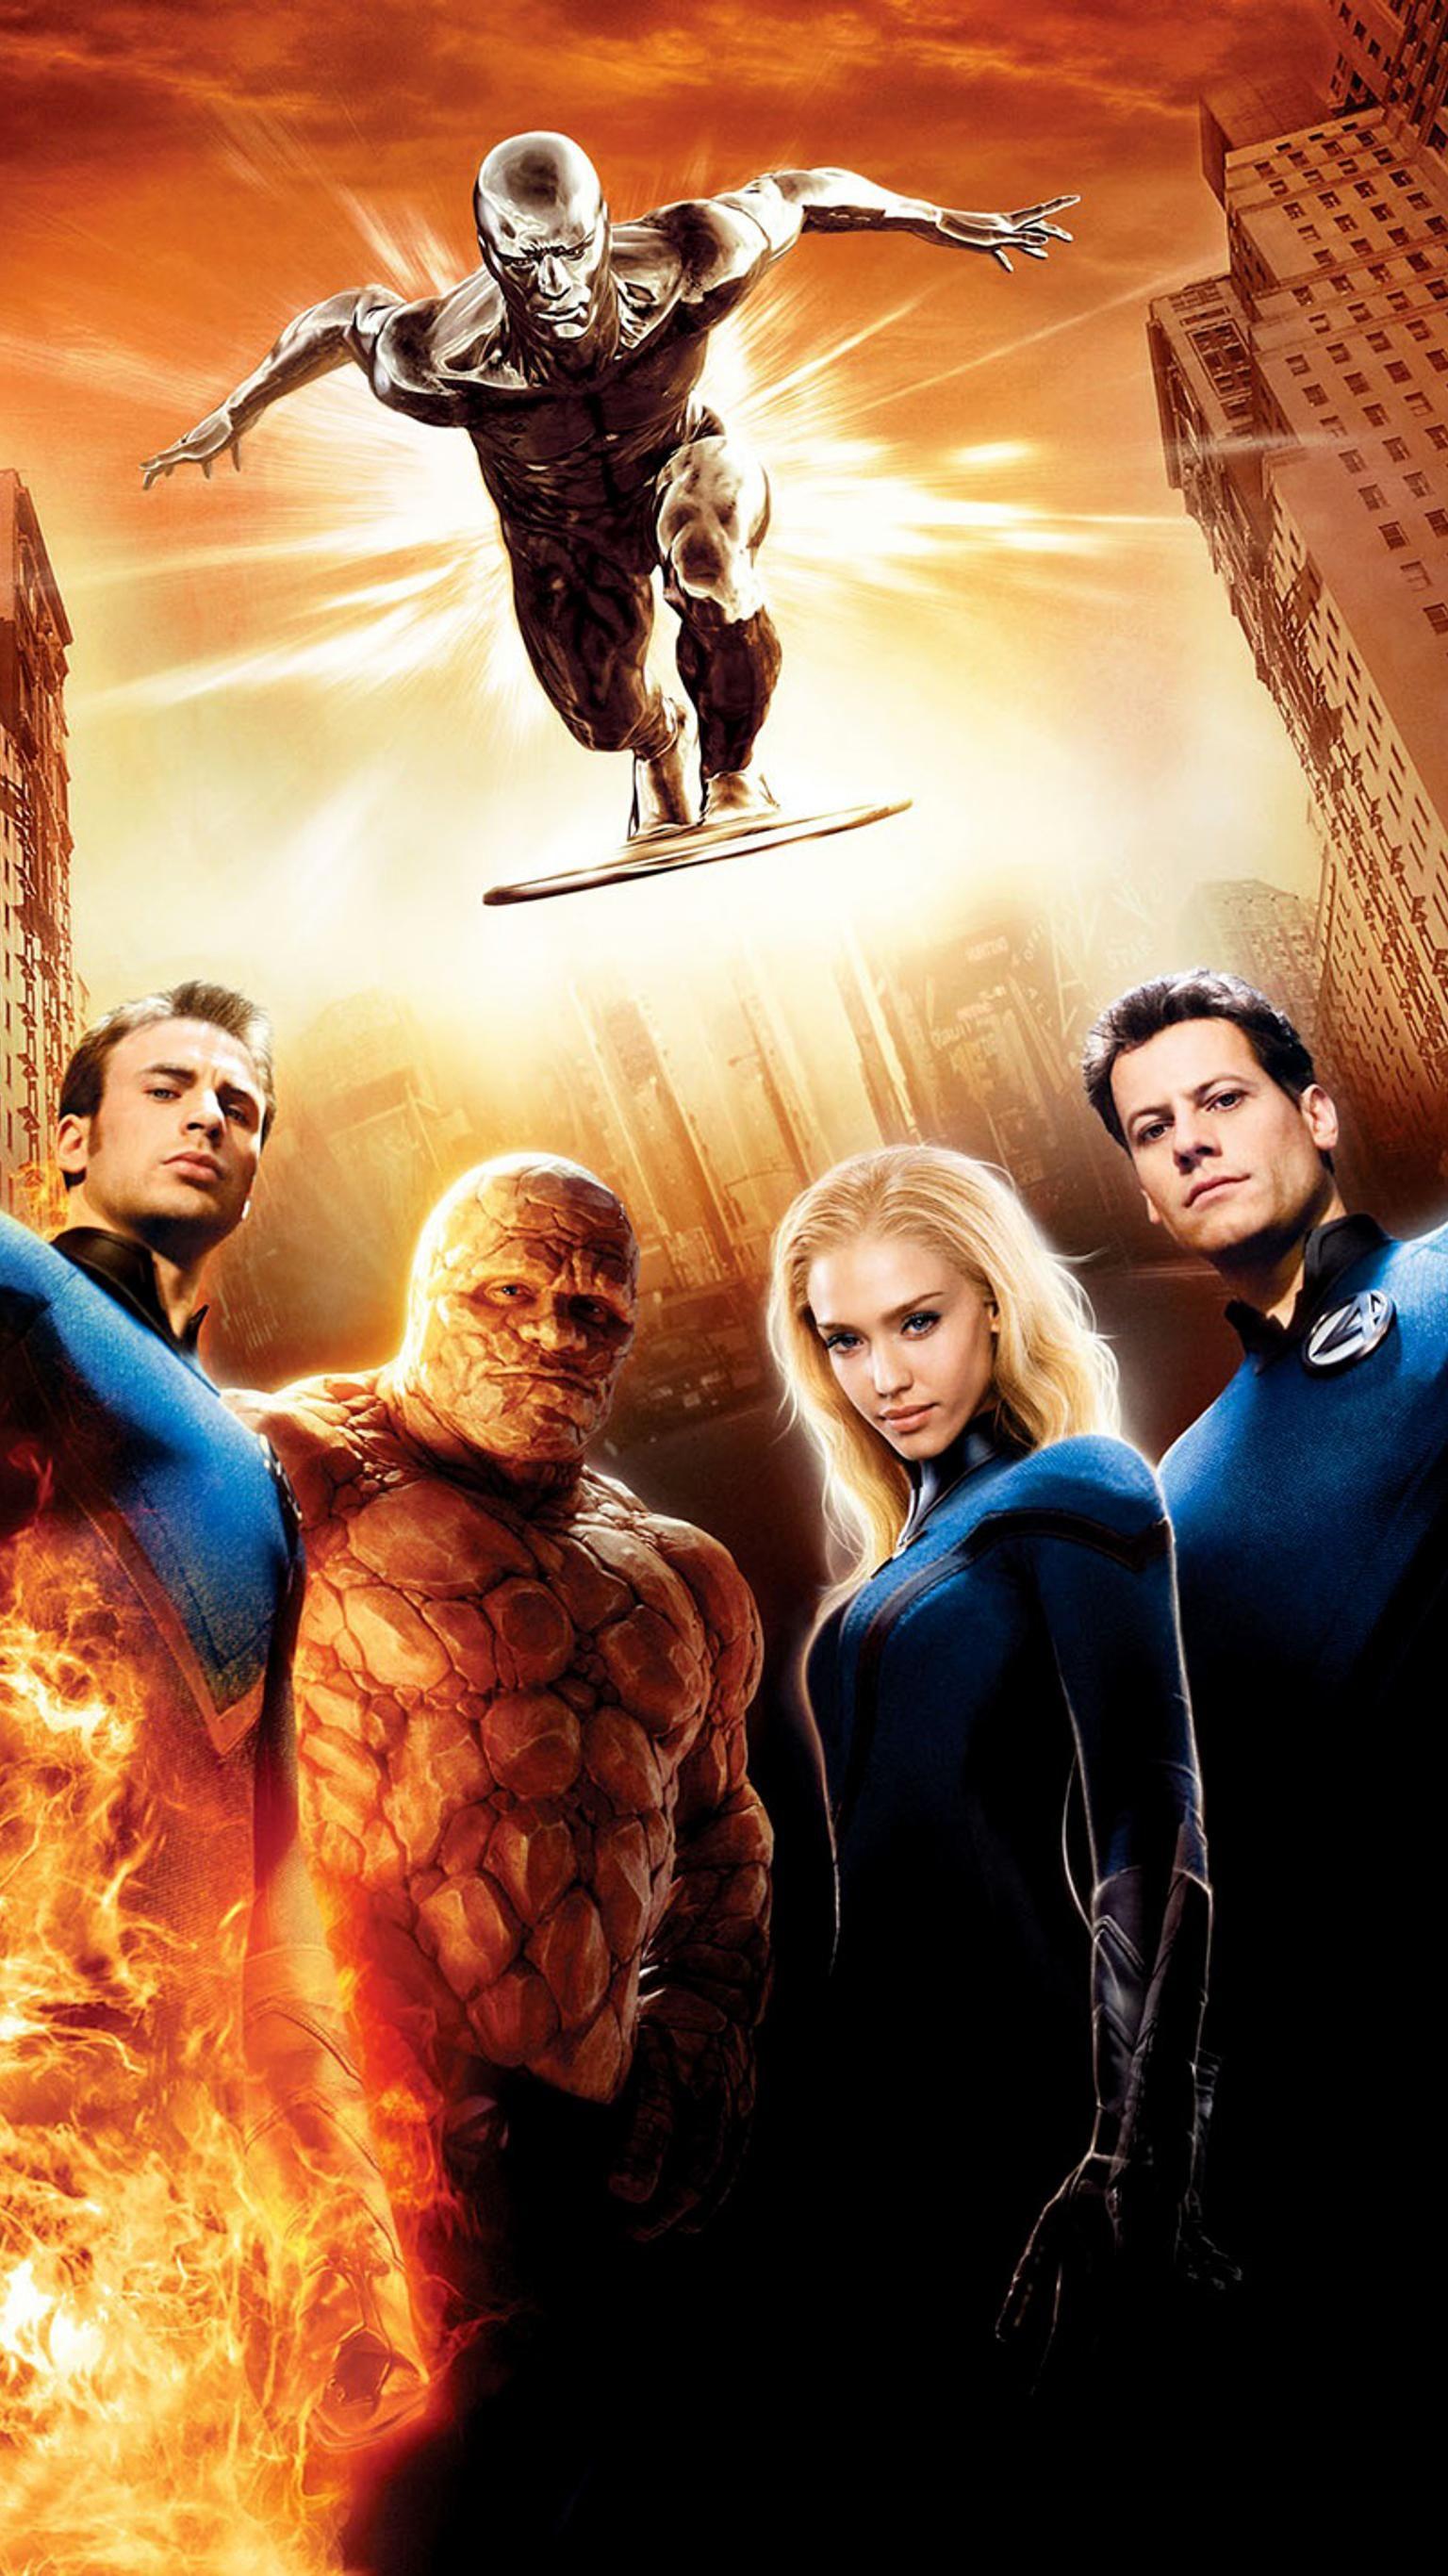 Fantastic Four Rise Of The Silver Surfer 2007 Phone Wallpaper Moviemania Silver Surfer Fantastic Four Fantastic Four 2007